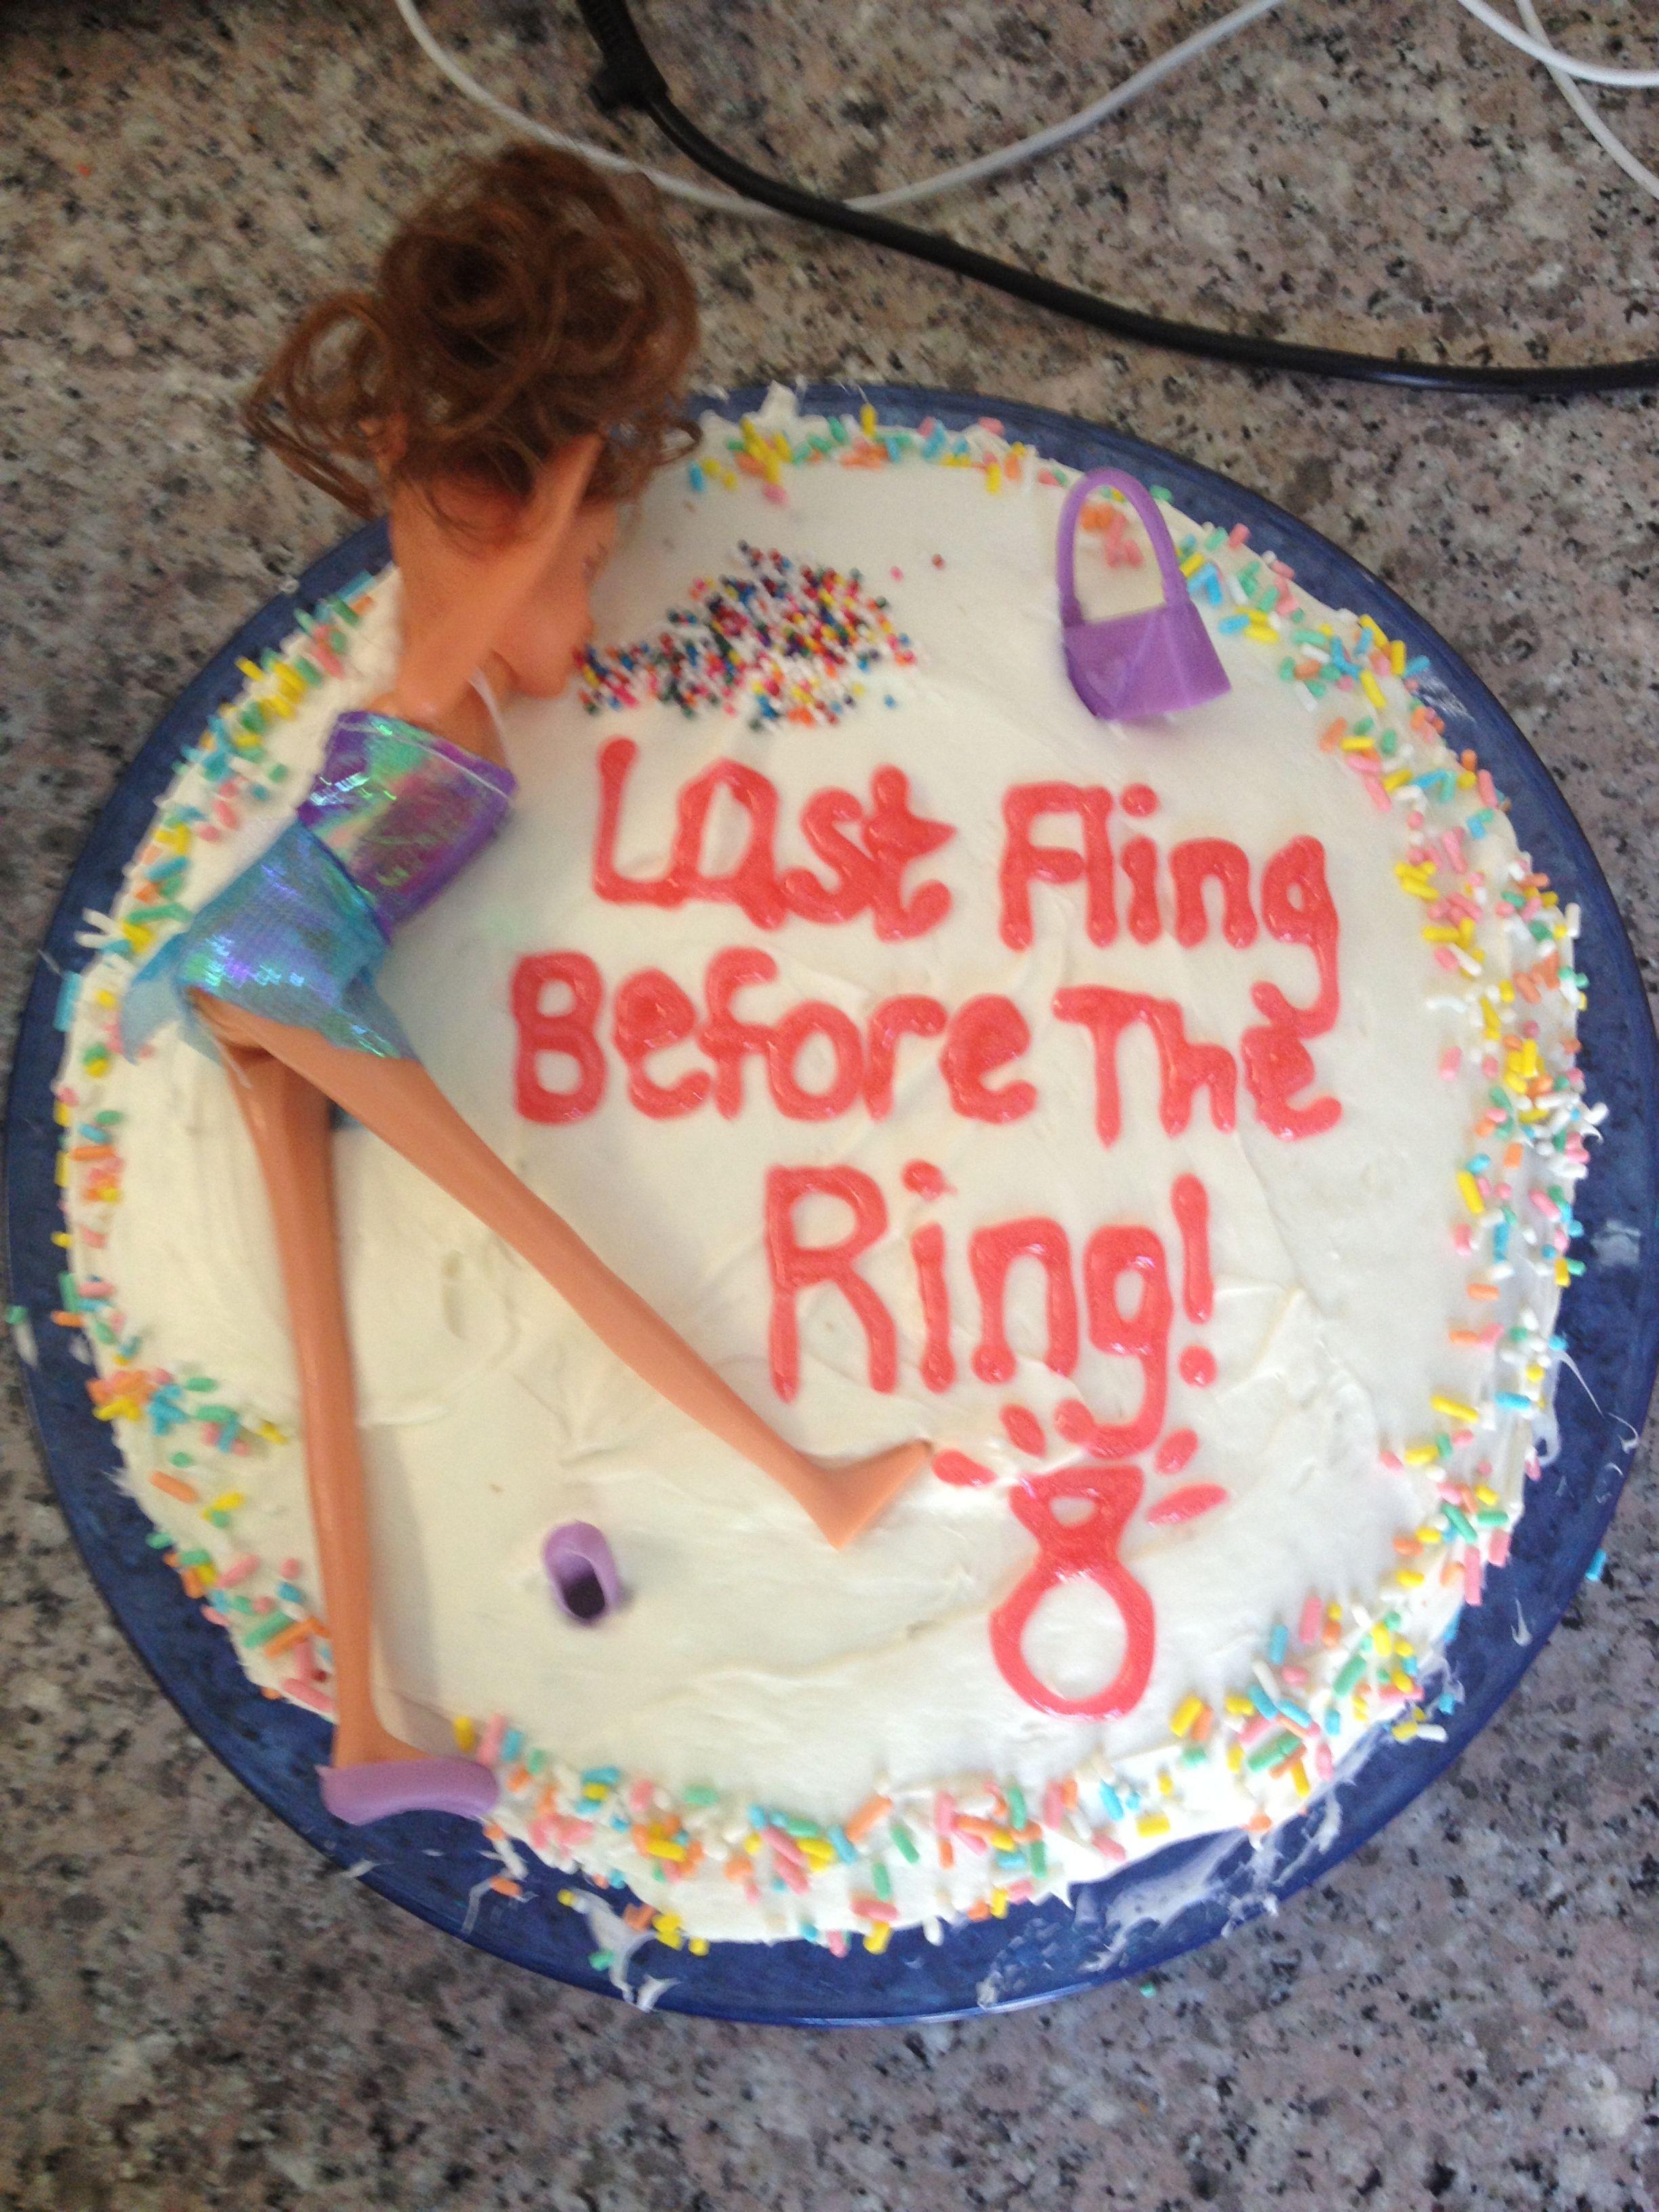 Bachelorette Barfing Barbie Cake